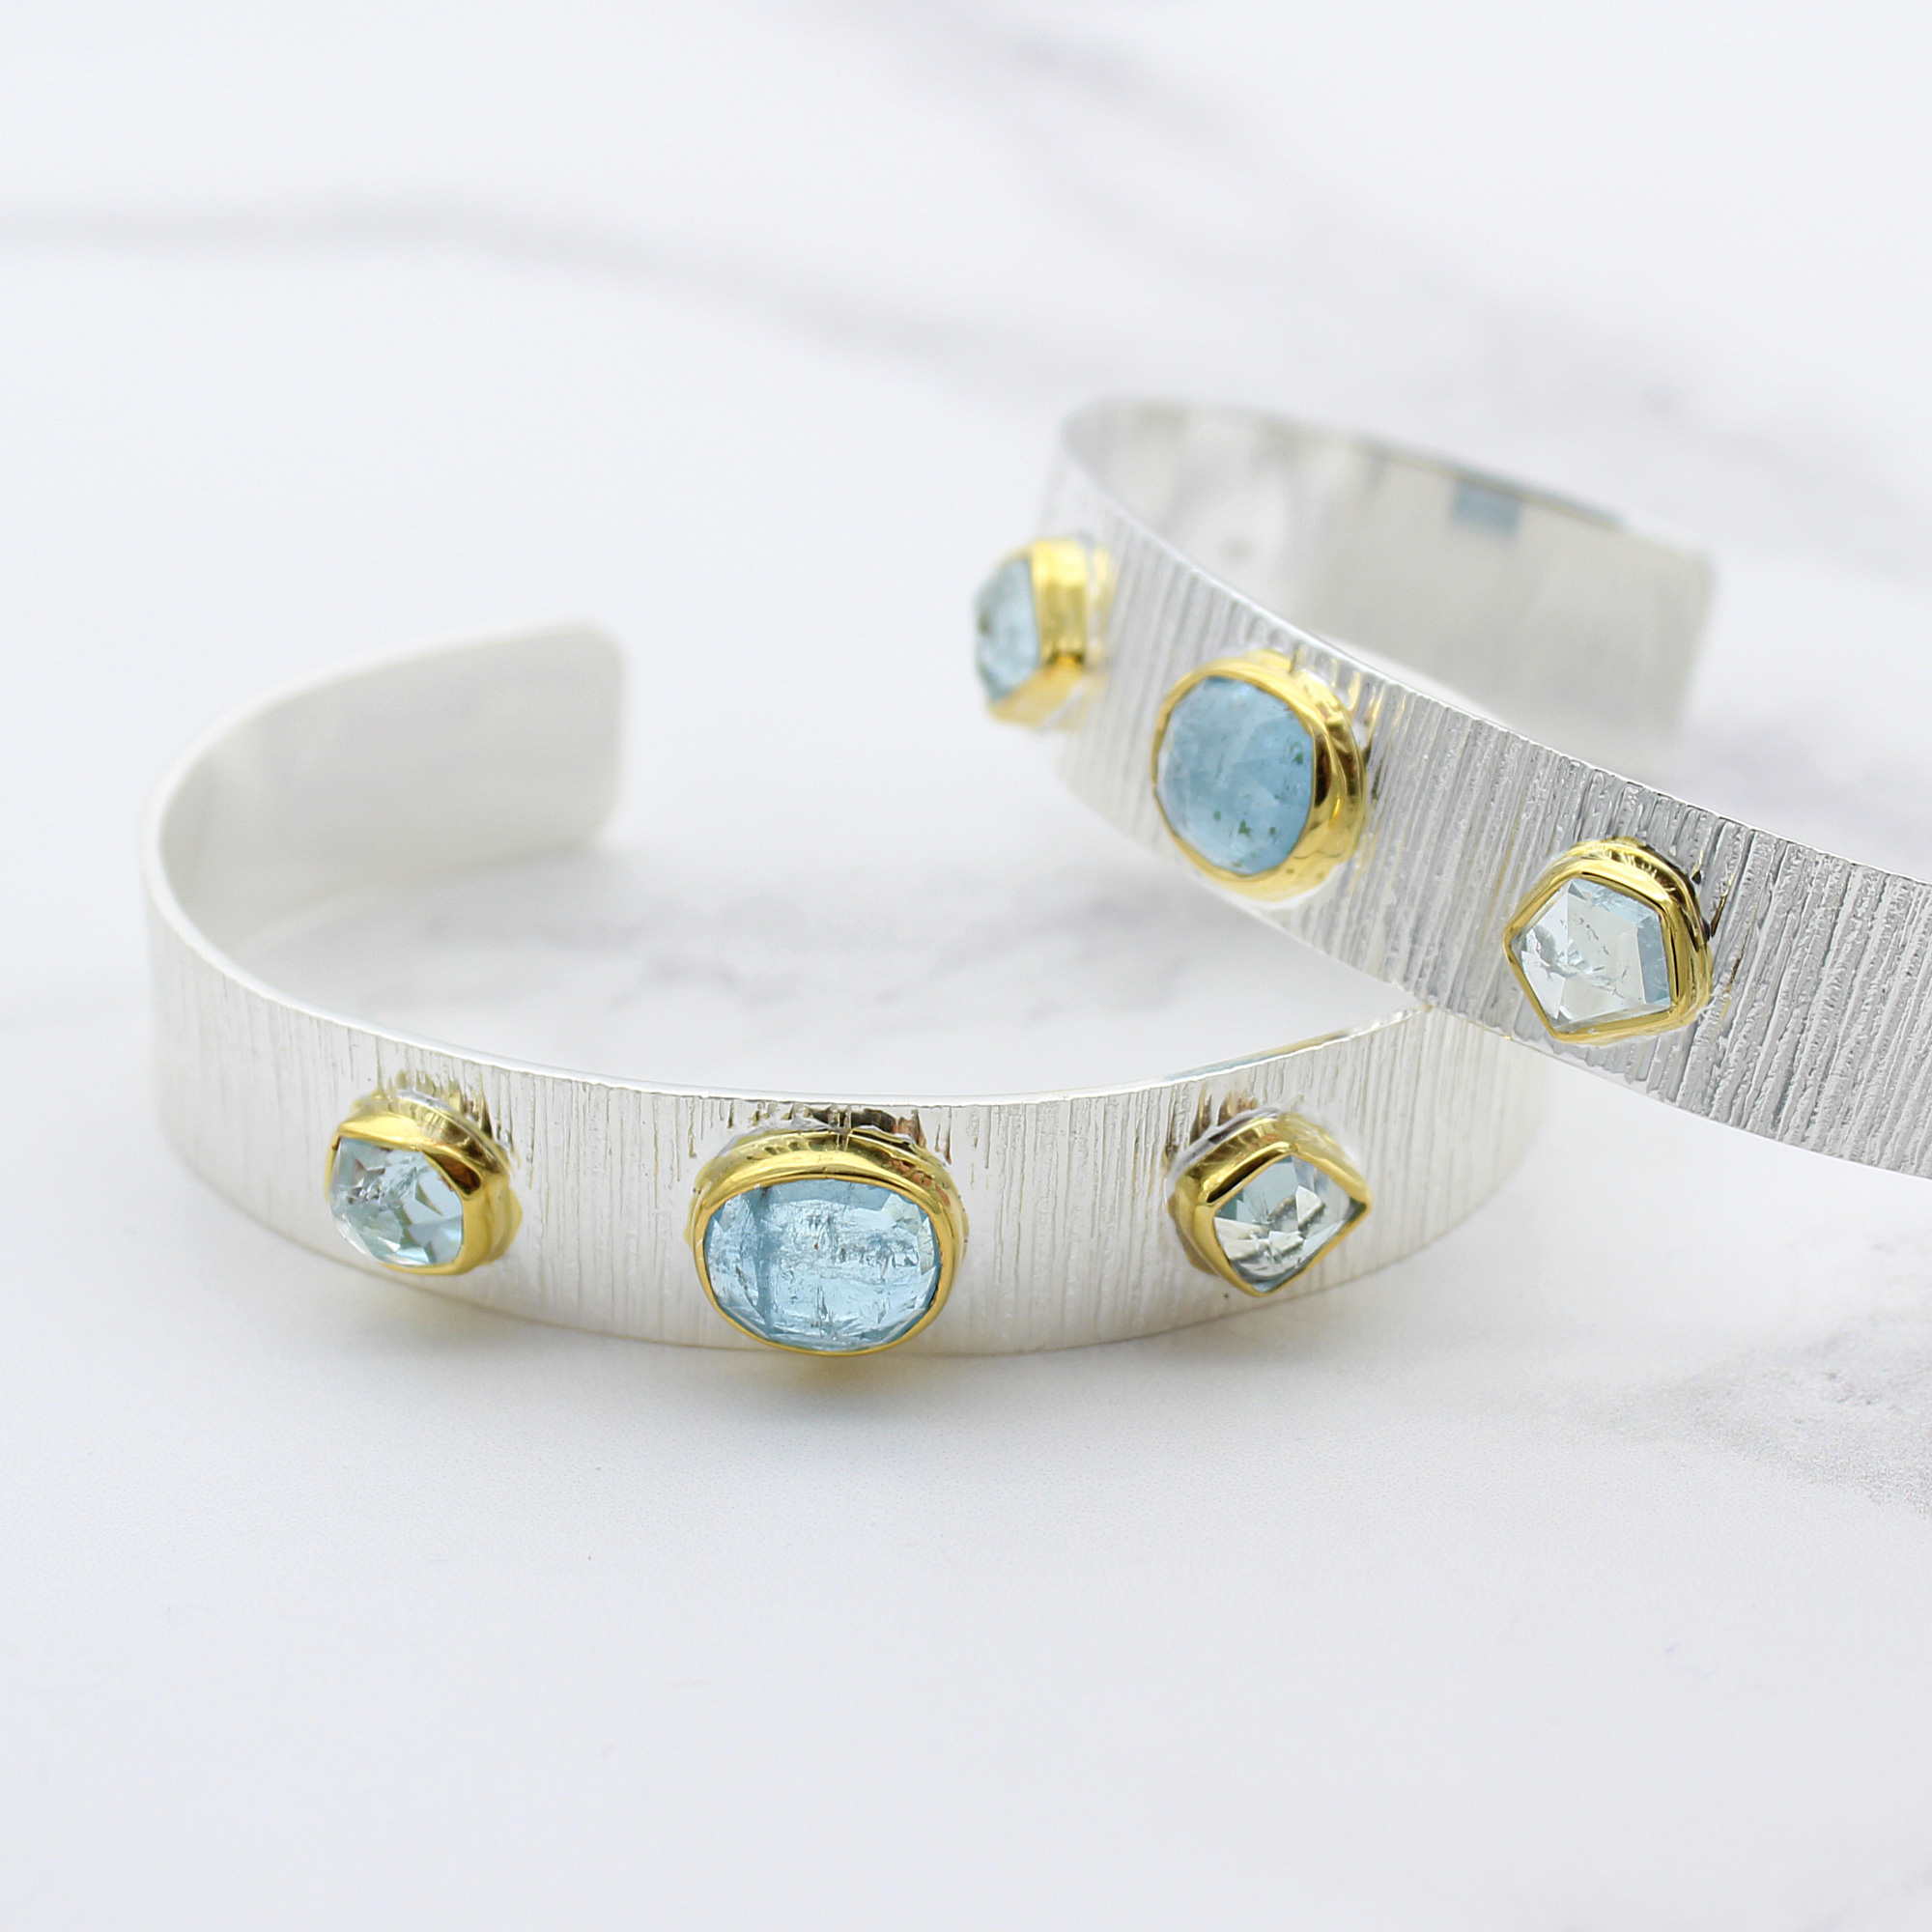 Aquamarine Gemstone Textured Sterling Silver Cuff